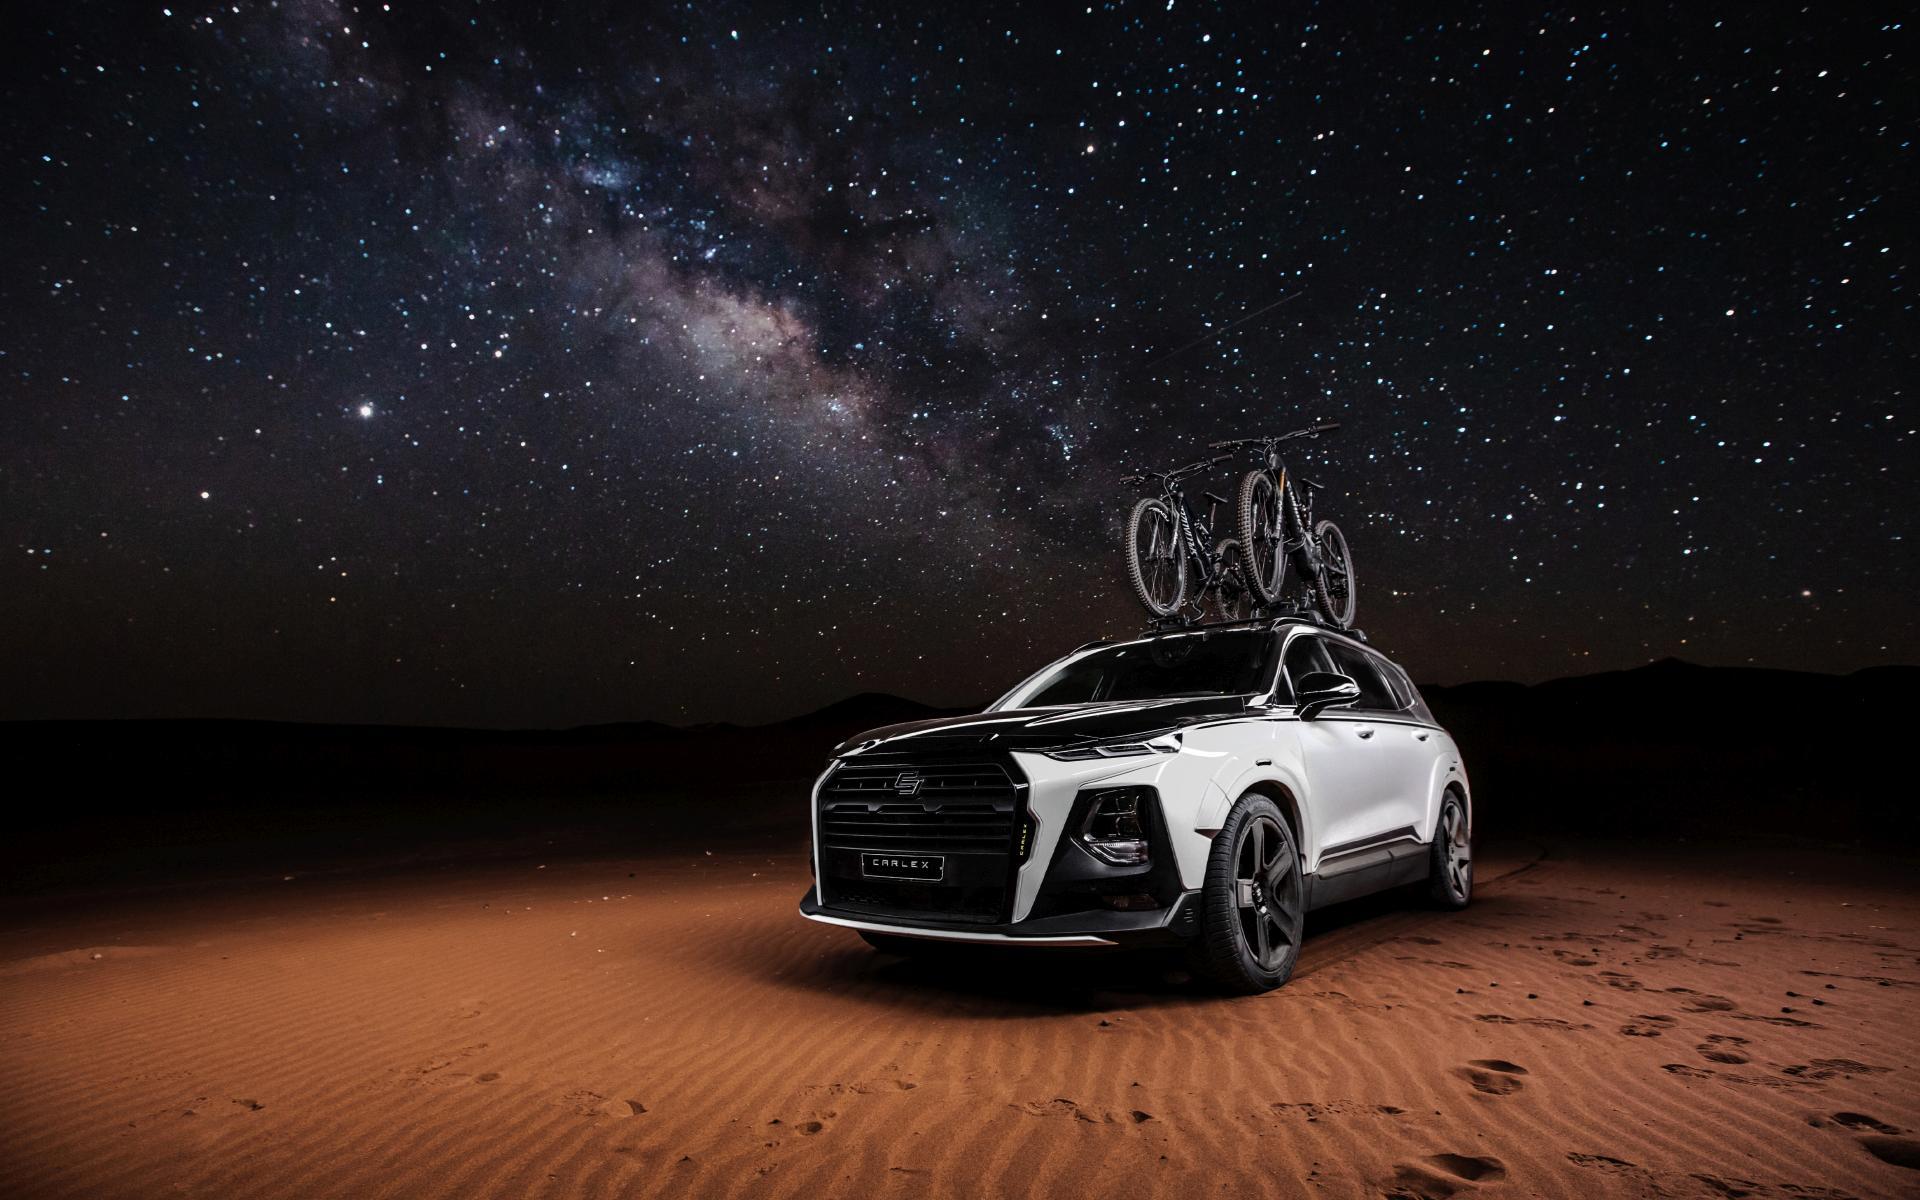 Hyundai-Santa-Fe-by-Carlex-Design-39